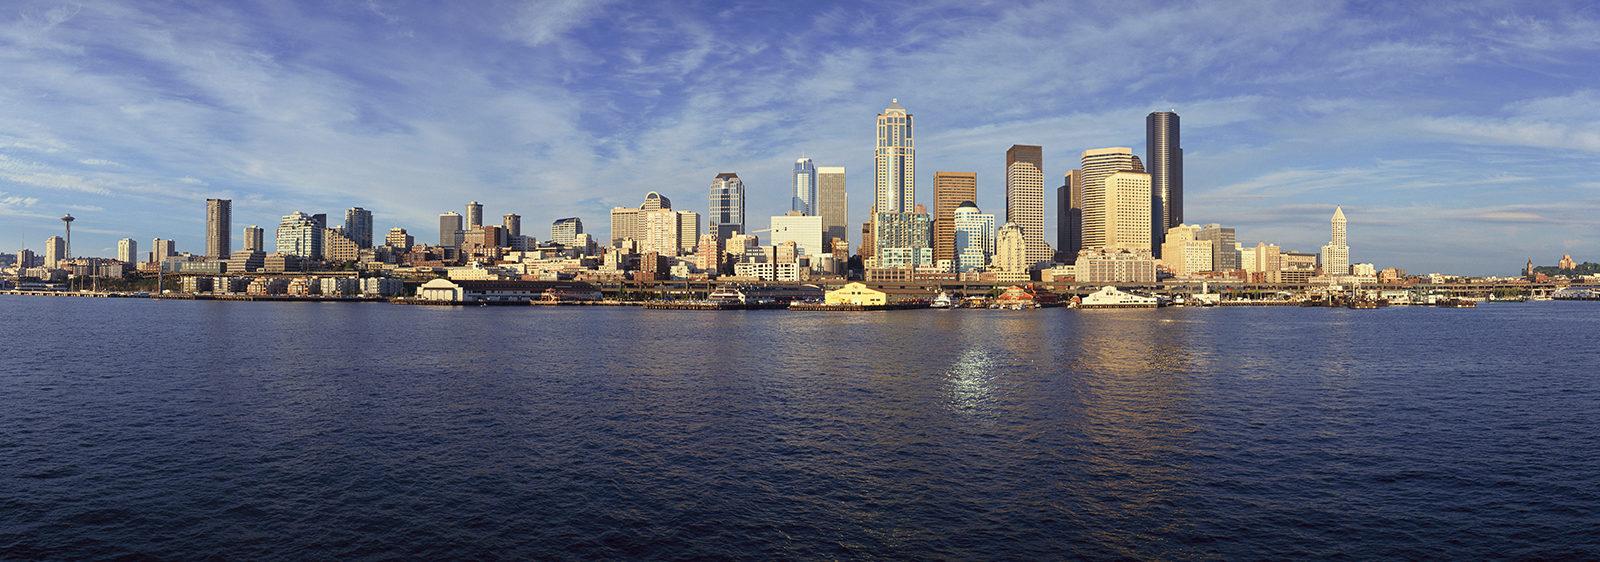 Seattle, Washington skyline from Puget Sound